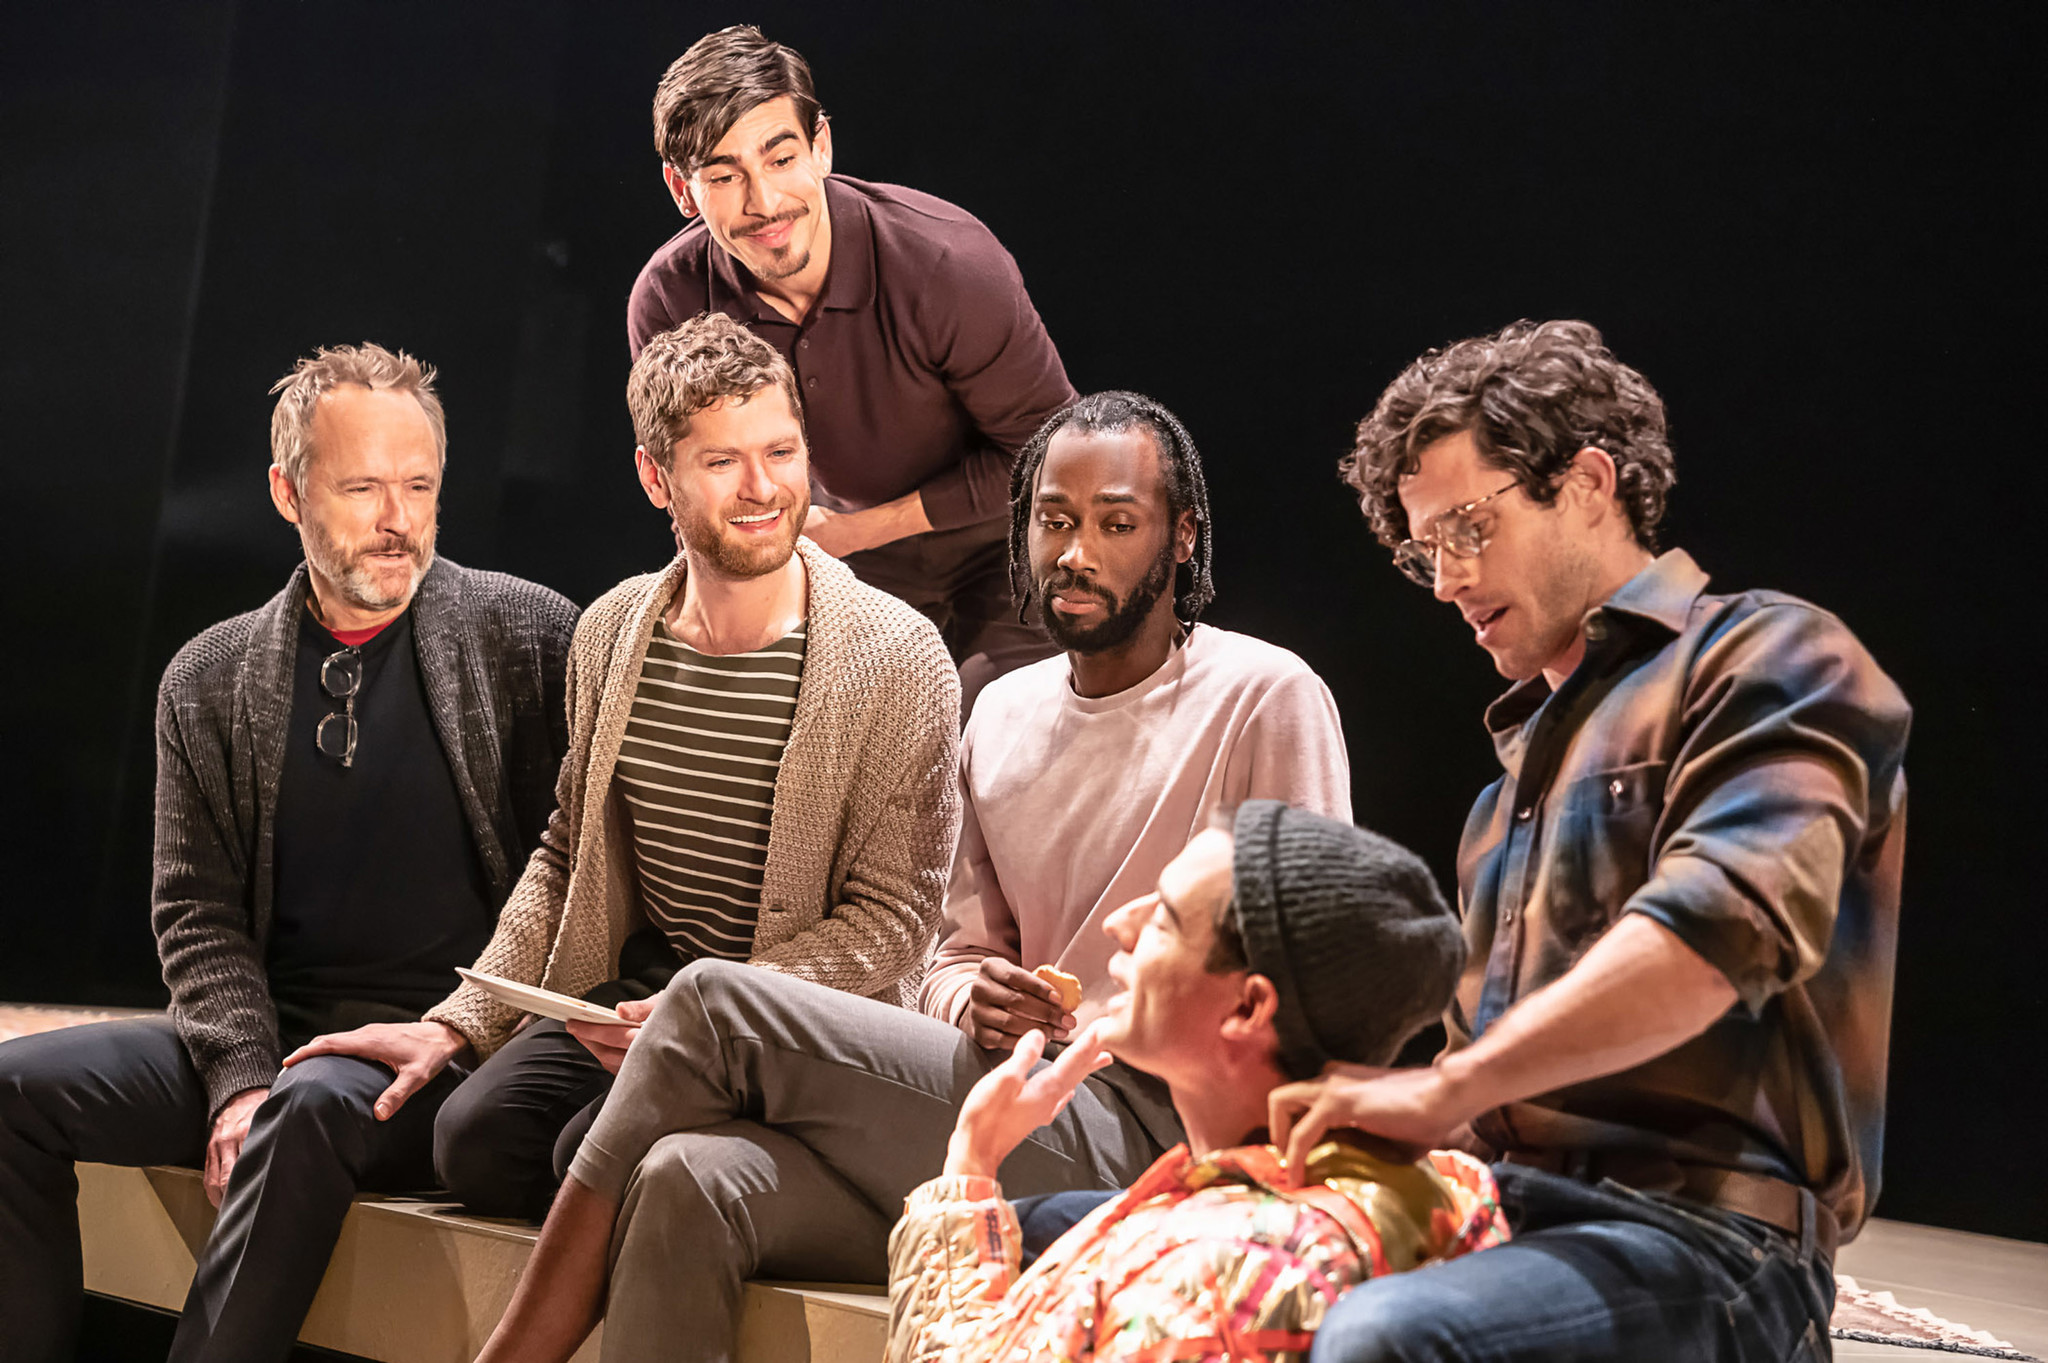 'The Inheritance's' John Benjamin Hickey tells Daily News epic play will break and heal hearts